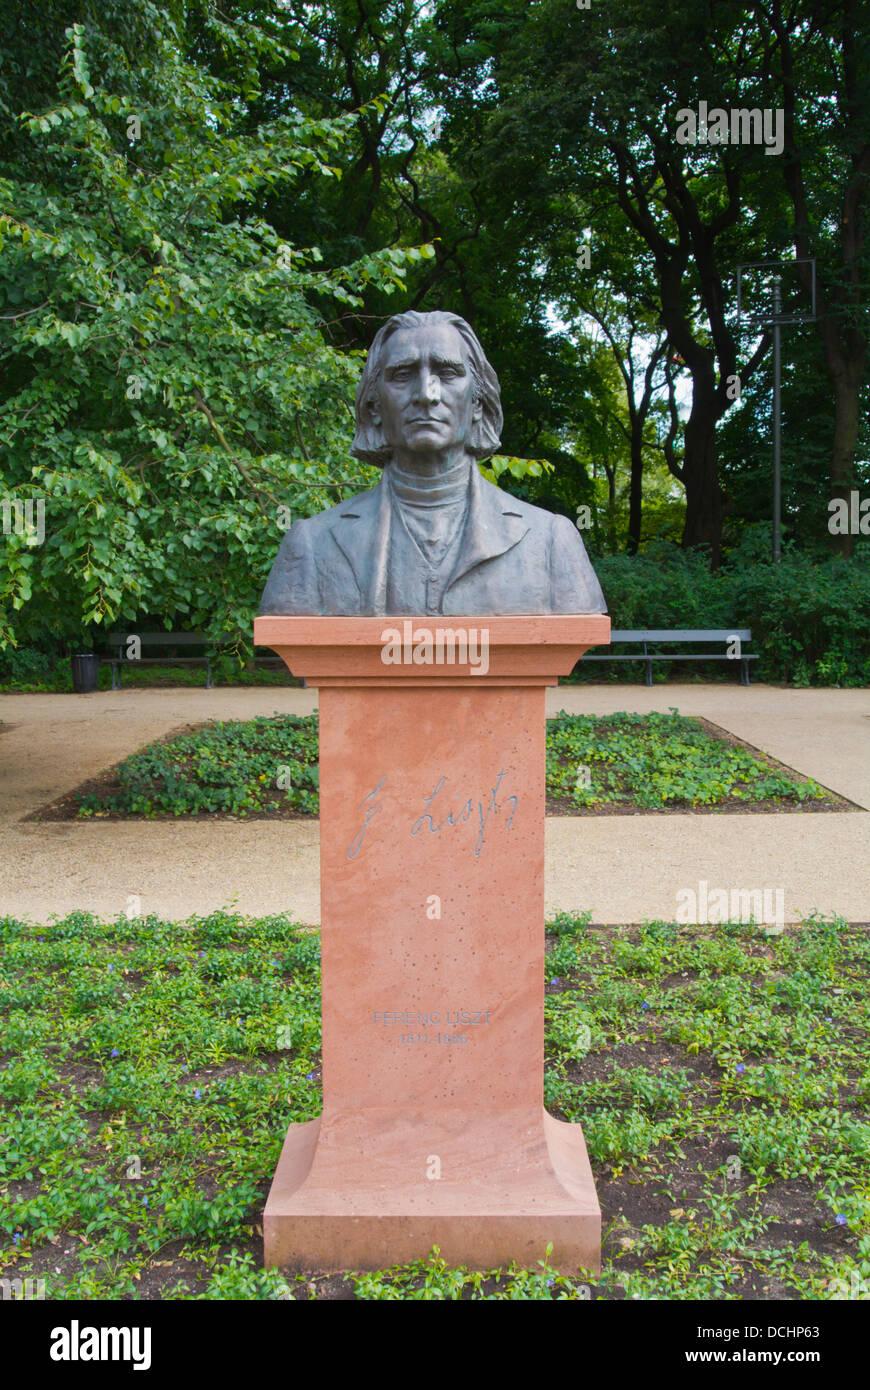 Franz Liszt statua Park Lazienkowski il Lazienki Park District Ujazdow Varsavia Polonia Europa Immagini Stock